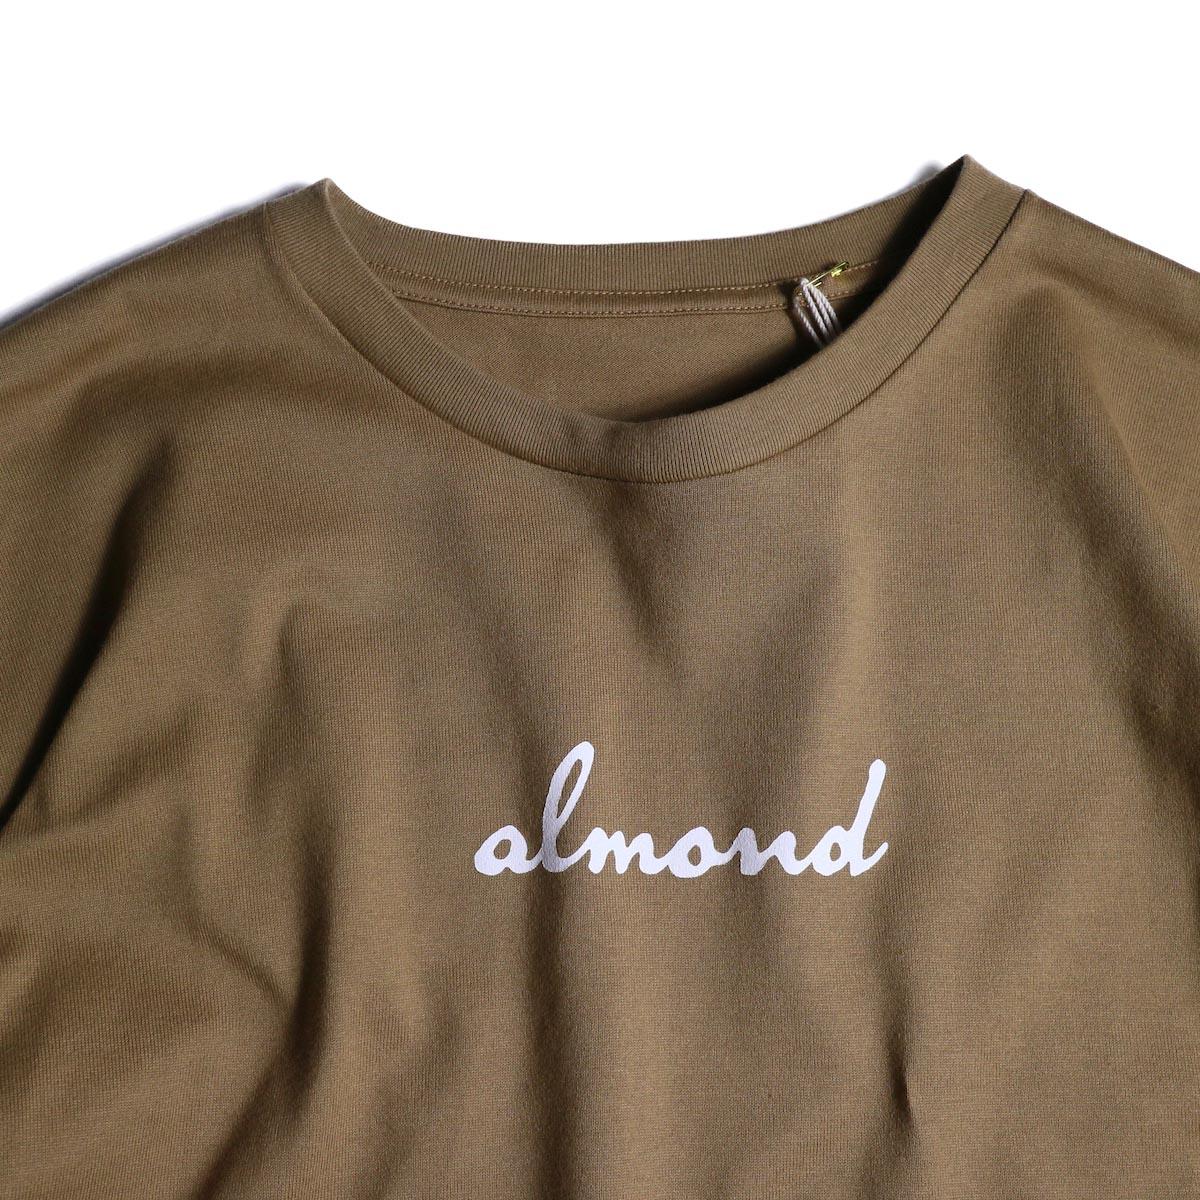 MASTER & Co. / Print T-Shrit (almond)ボートネック